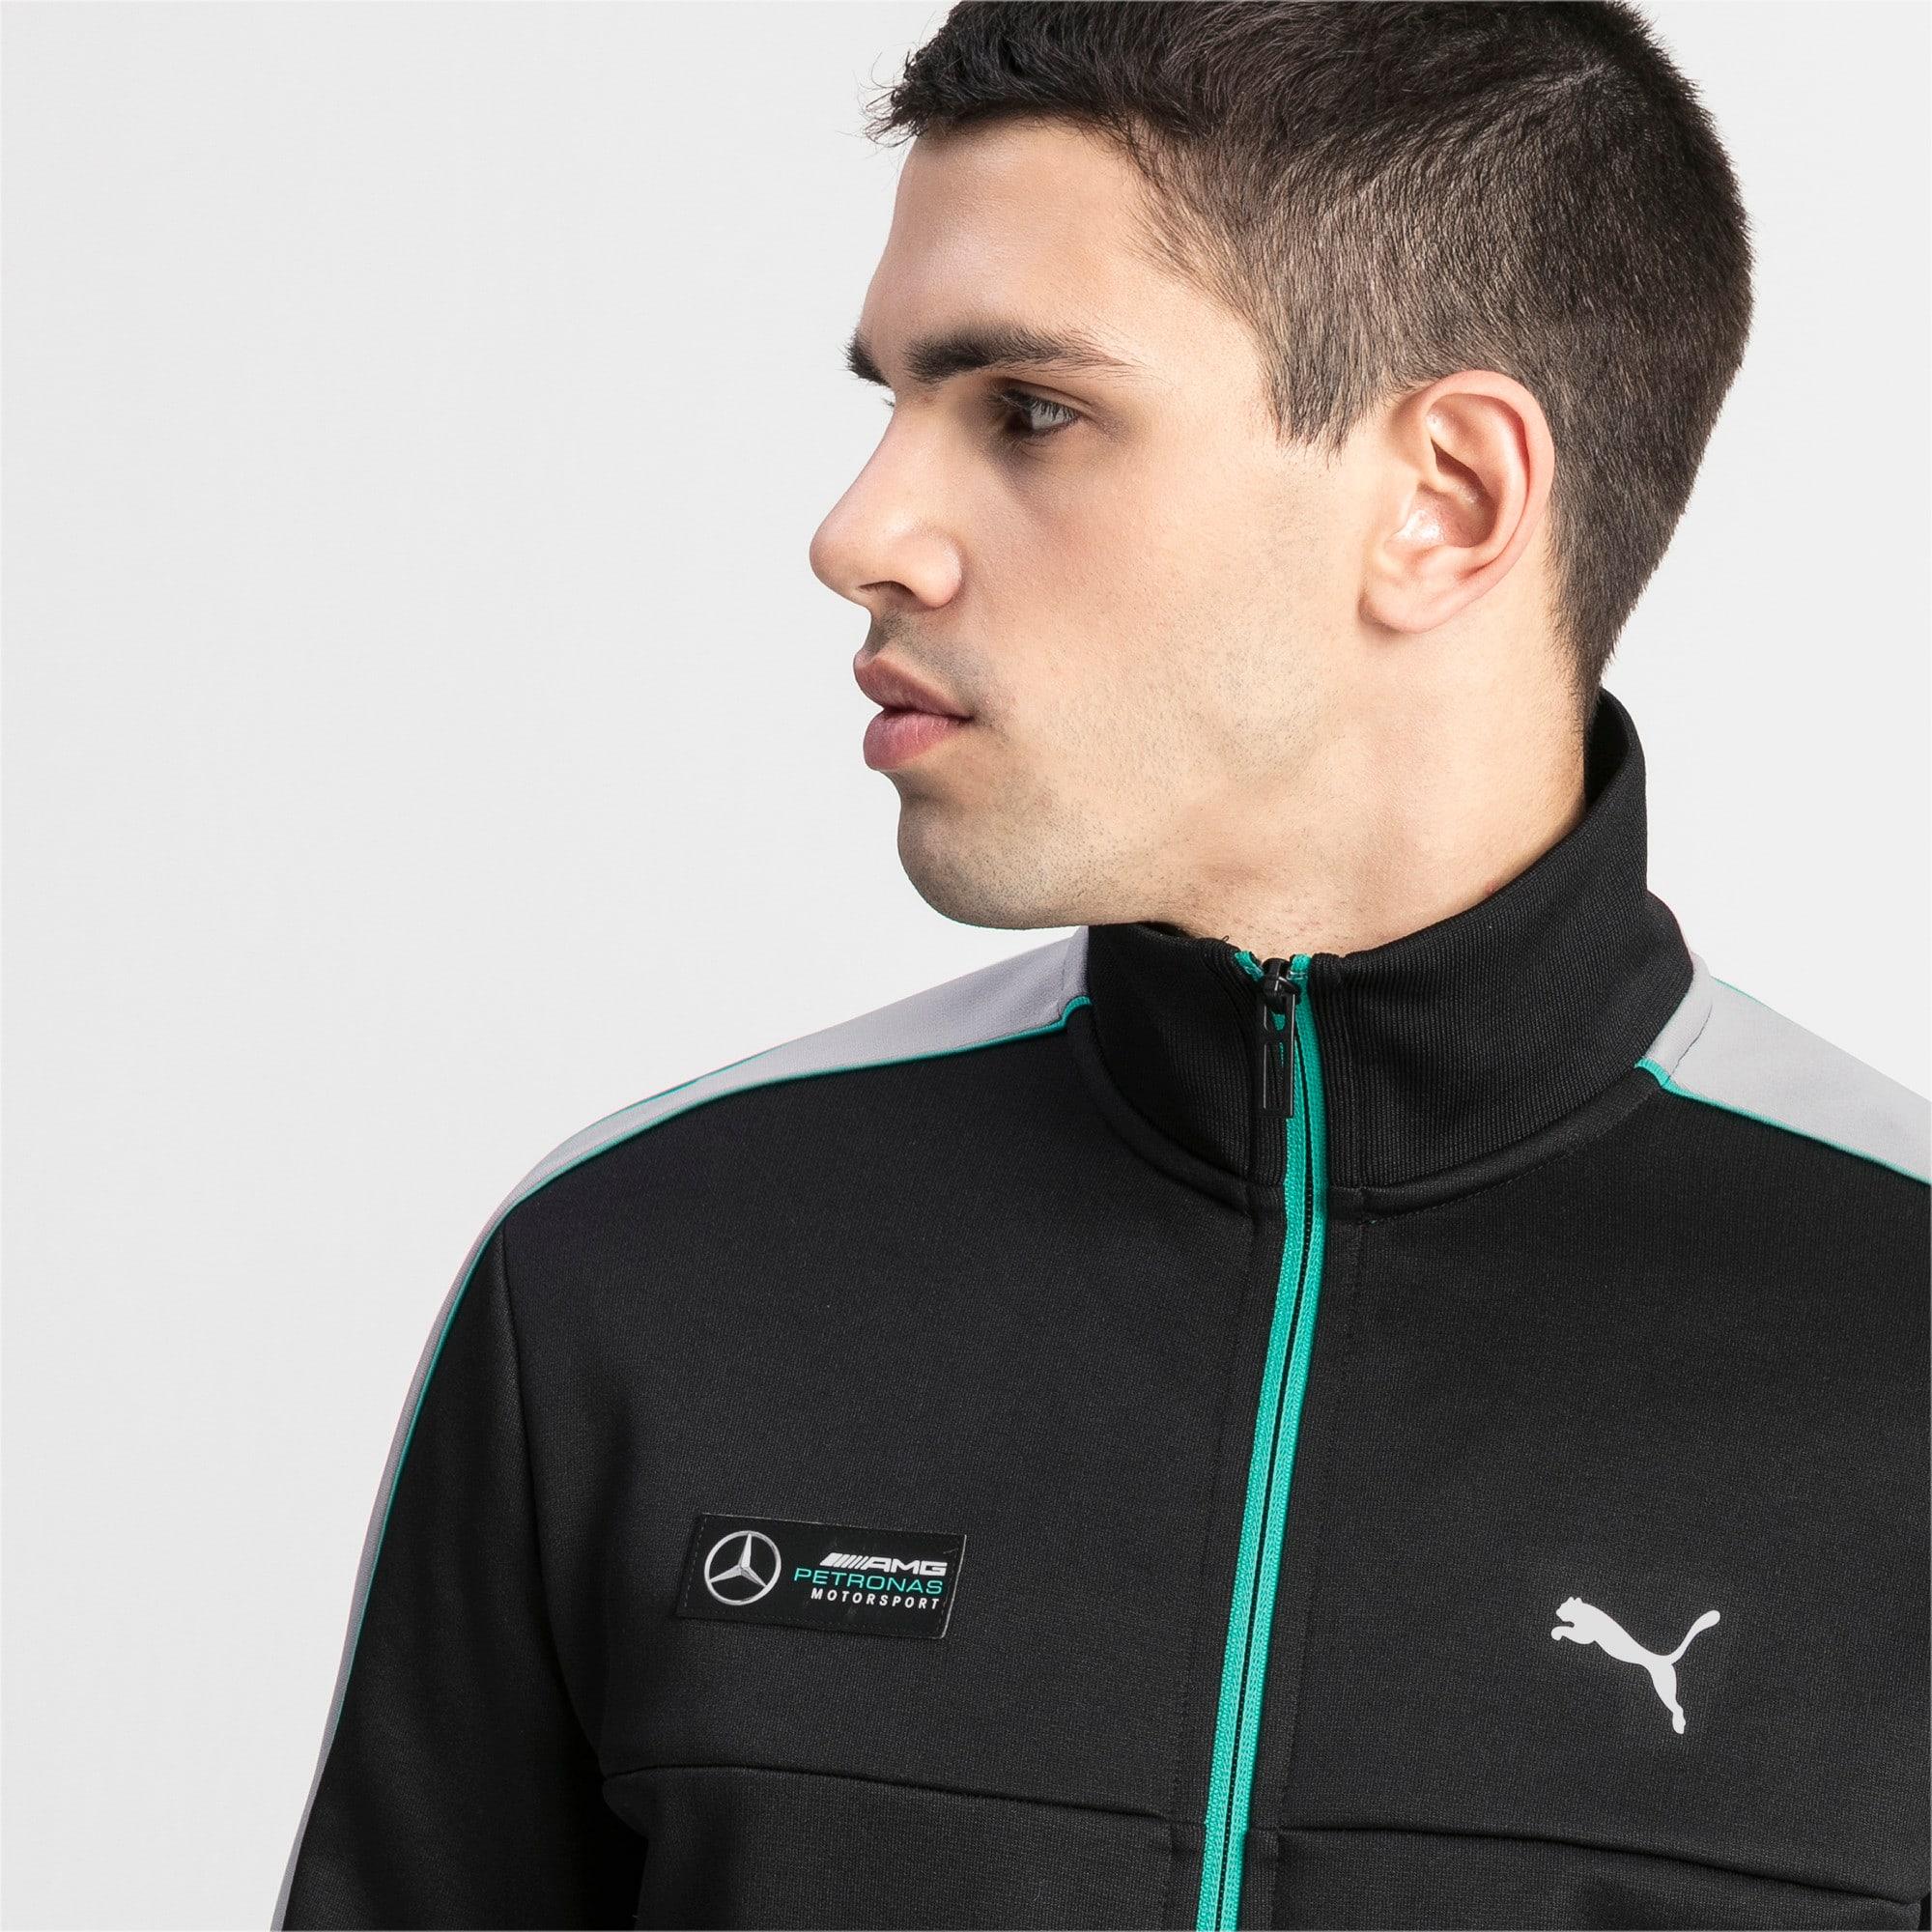 Thumbnail 4 of MAPM T7 Men's Track Jacket, Puma Black, medium